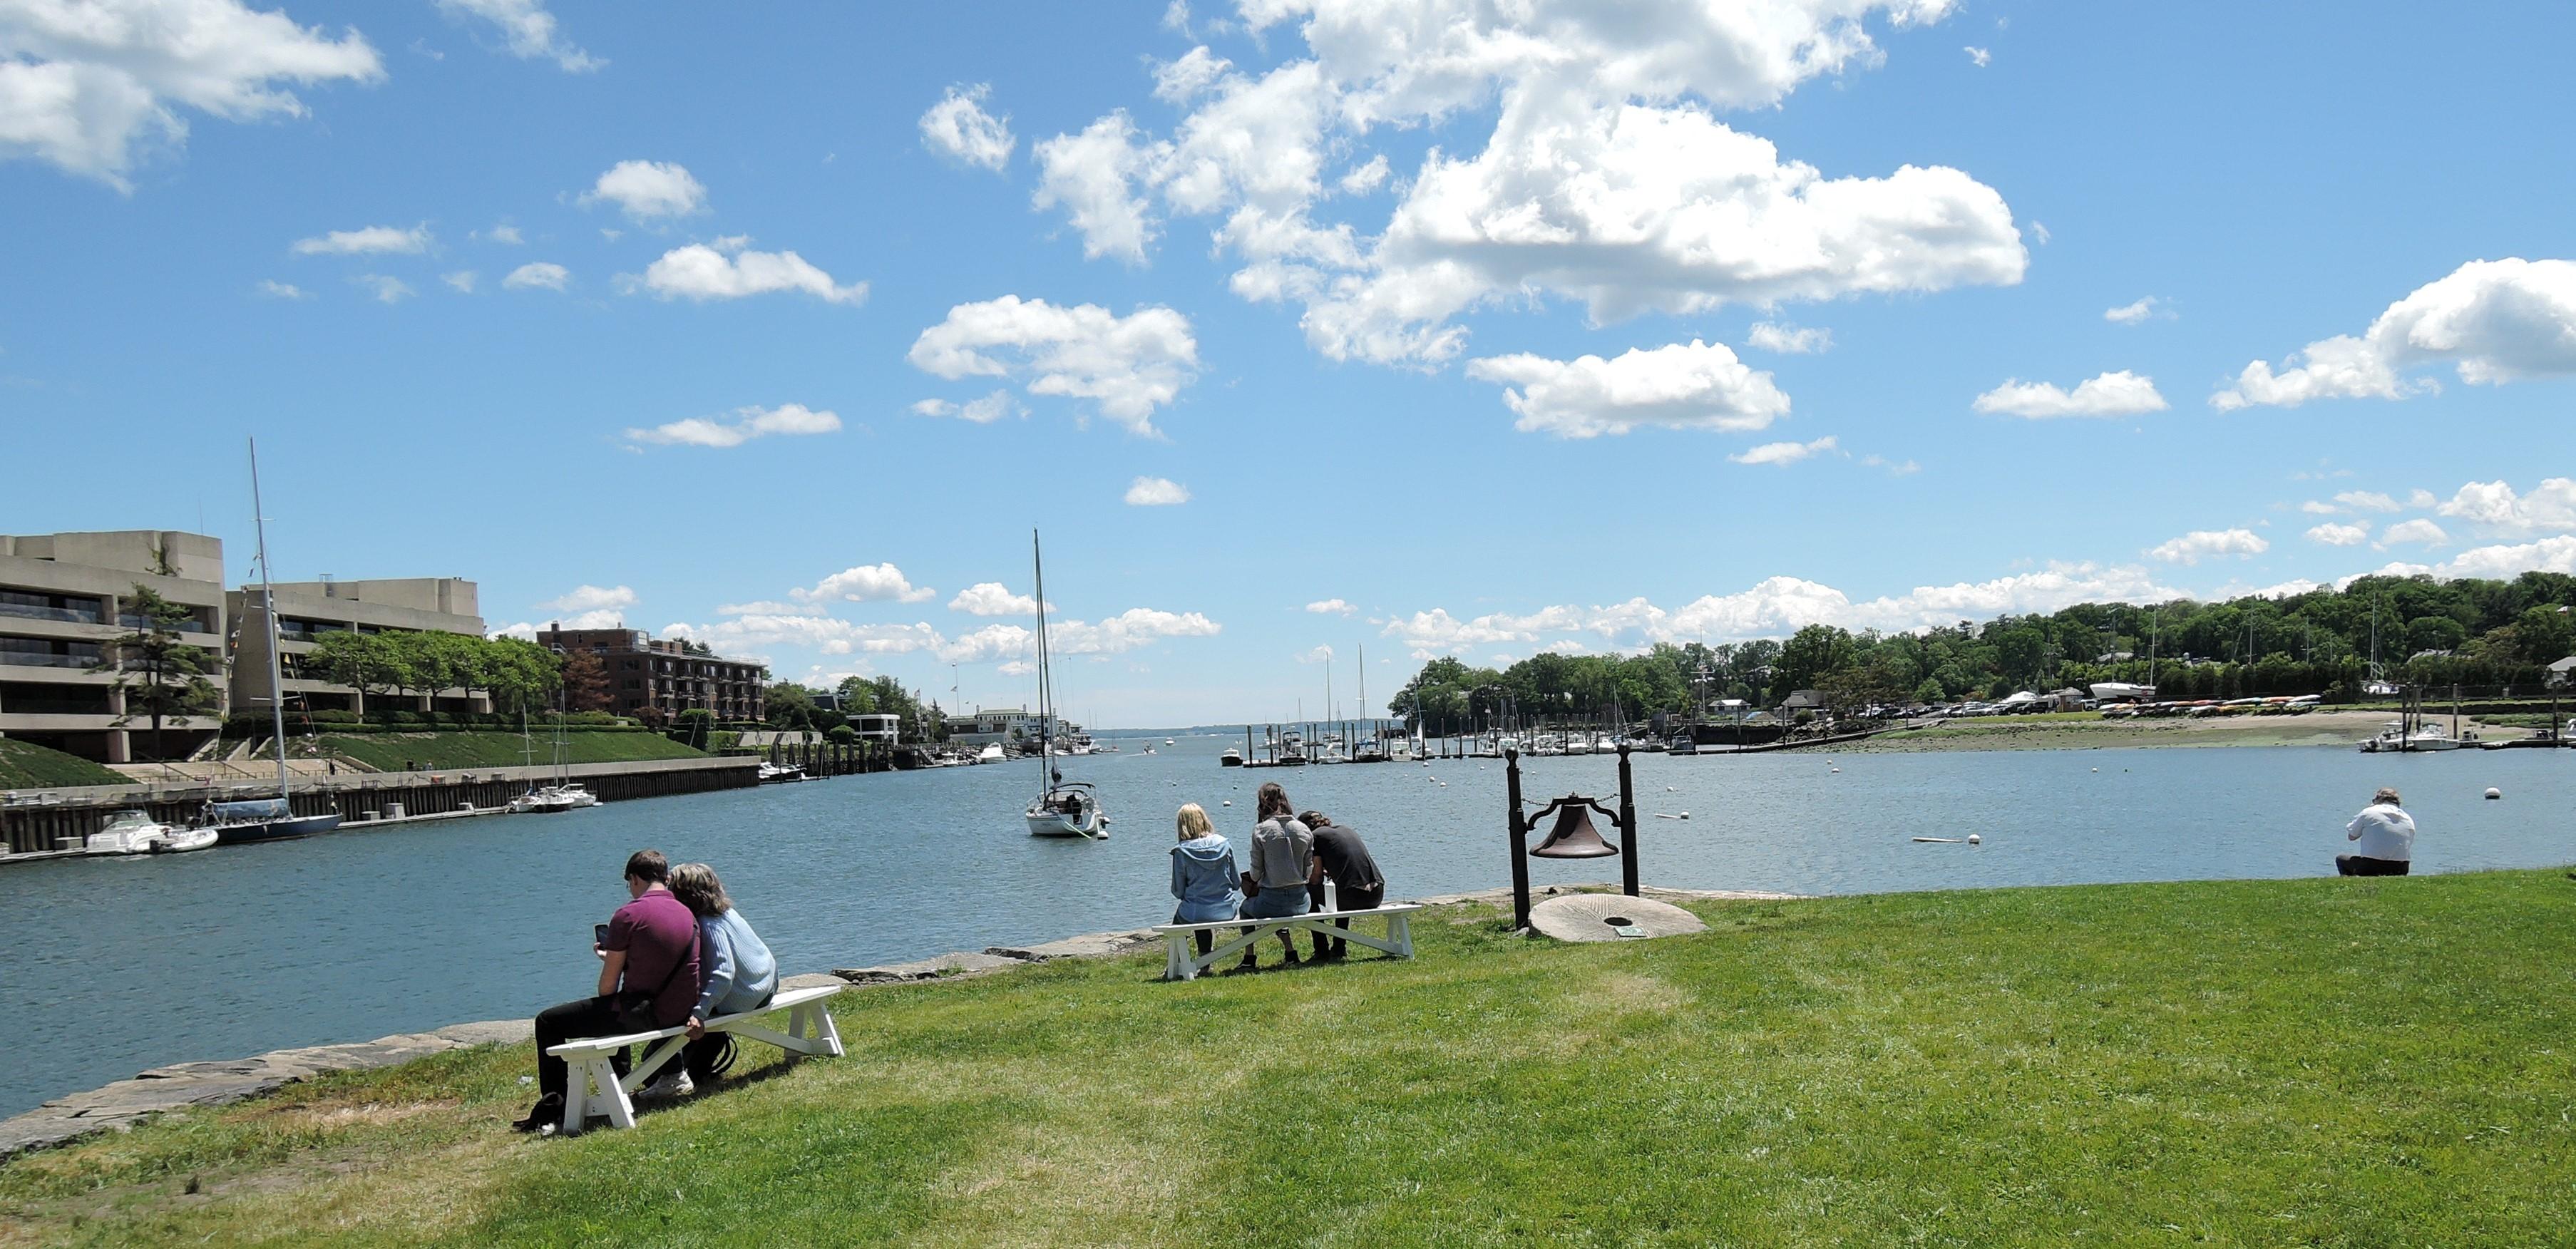 Greenwich Harbor - Greenwich Concours d'Elegance 2017